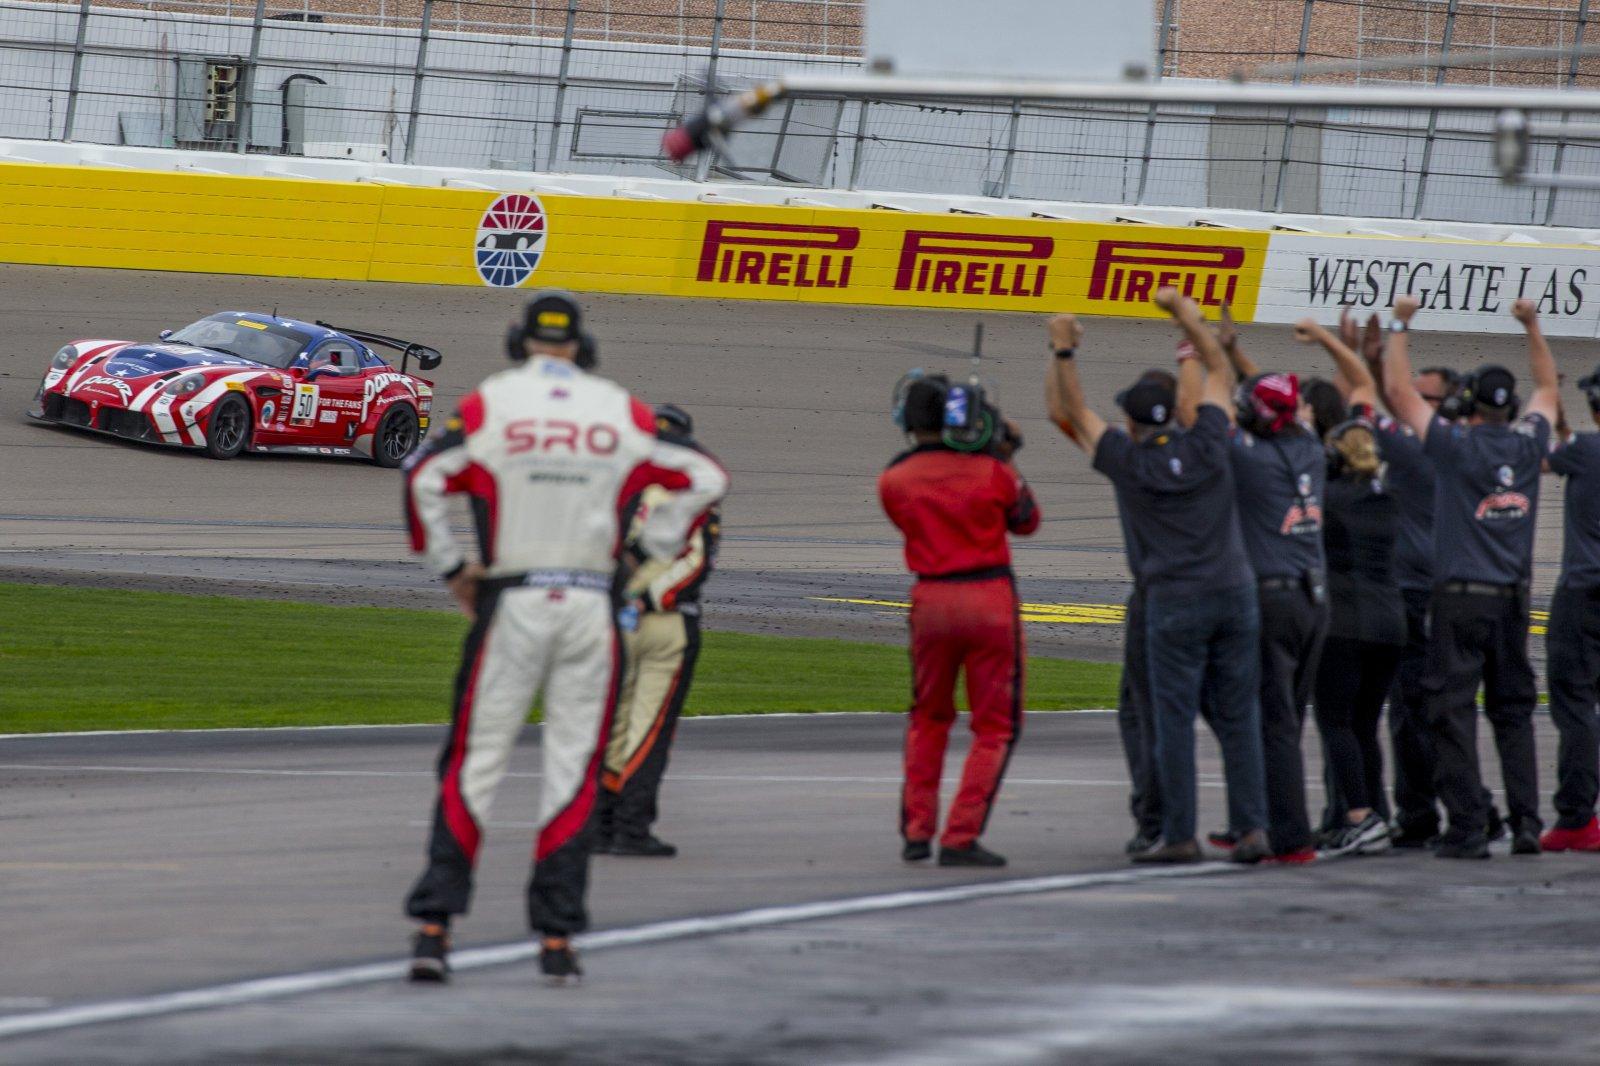 #50 Panoz Avezzano GT4, Ian James, Team Panoz Racing, Pirelli GT4  America, Las Vegas, October 2019 2019.